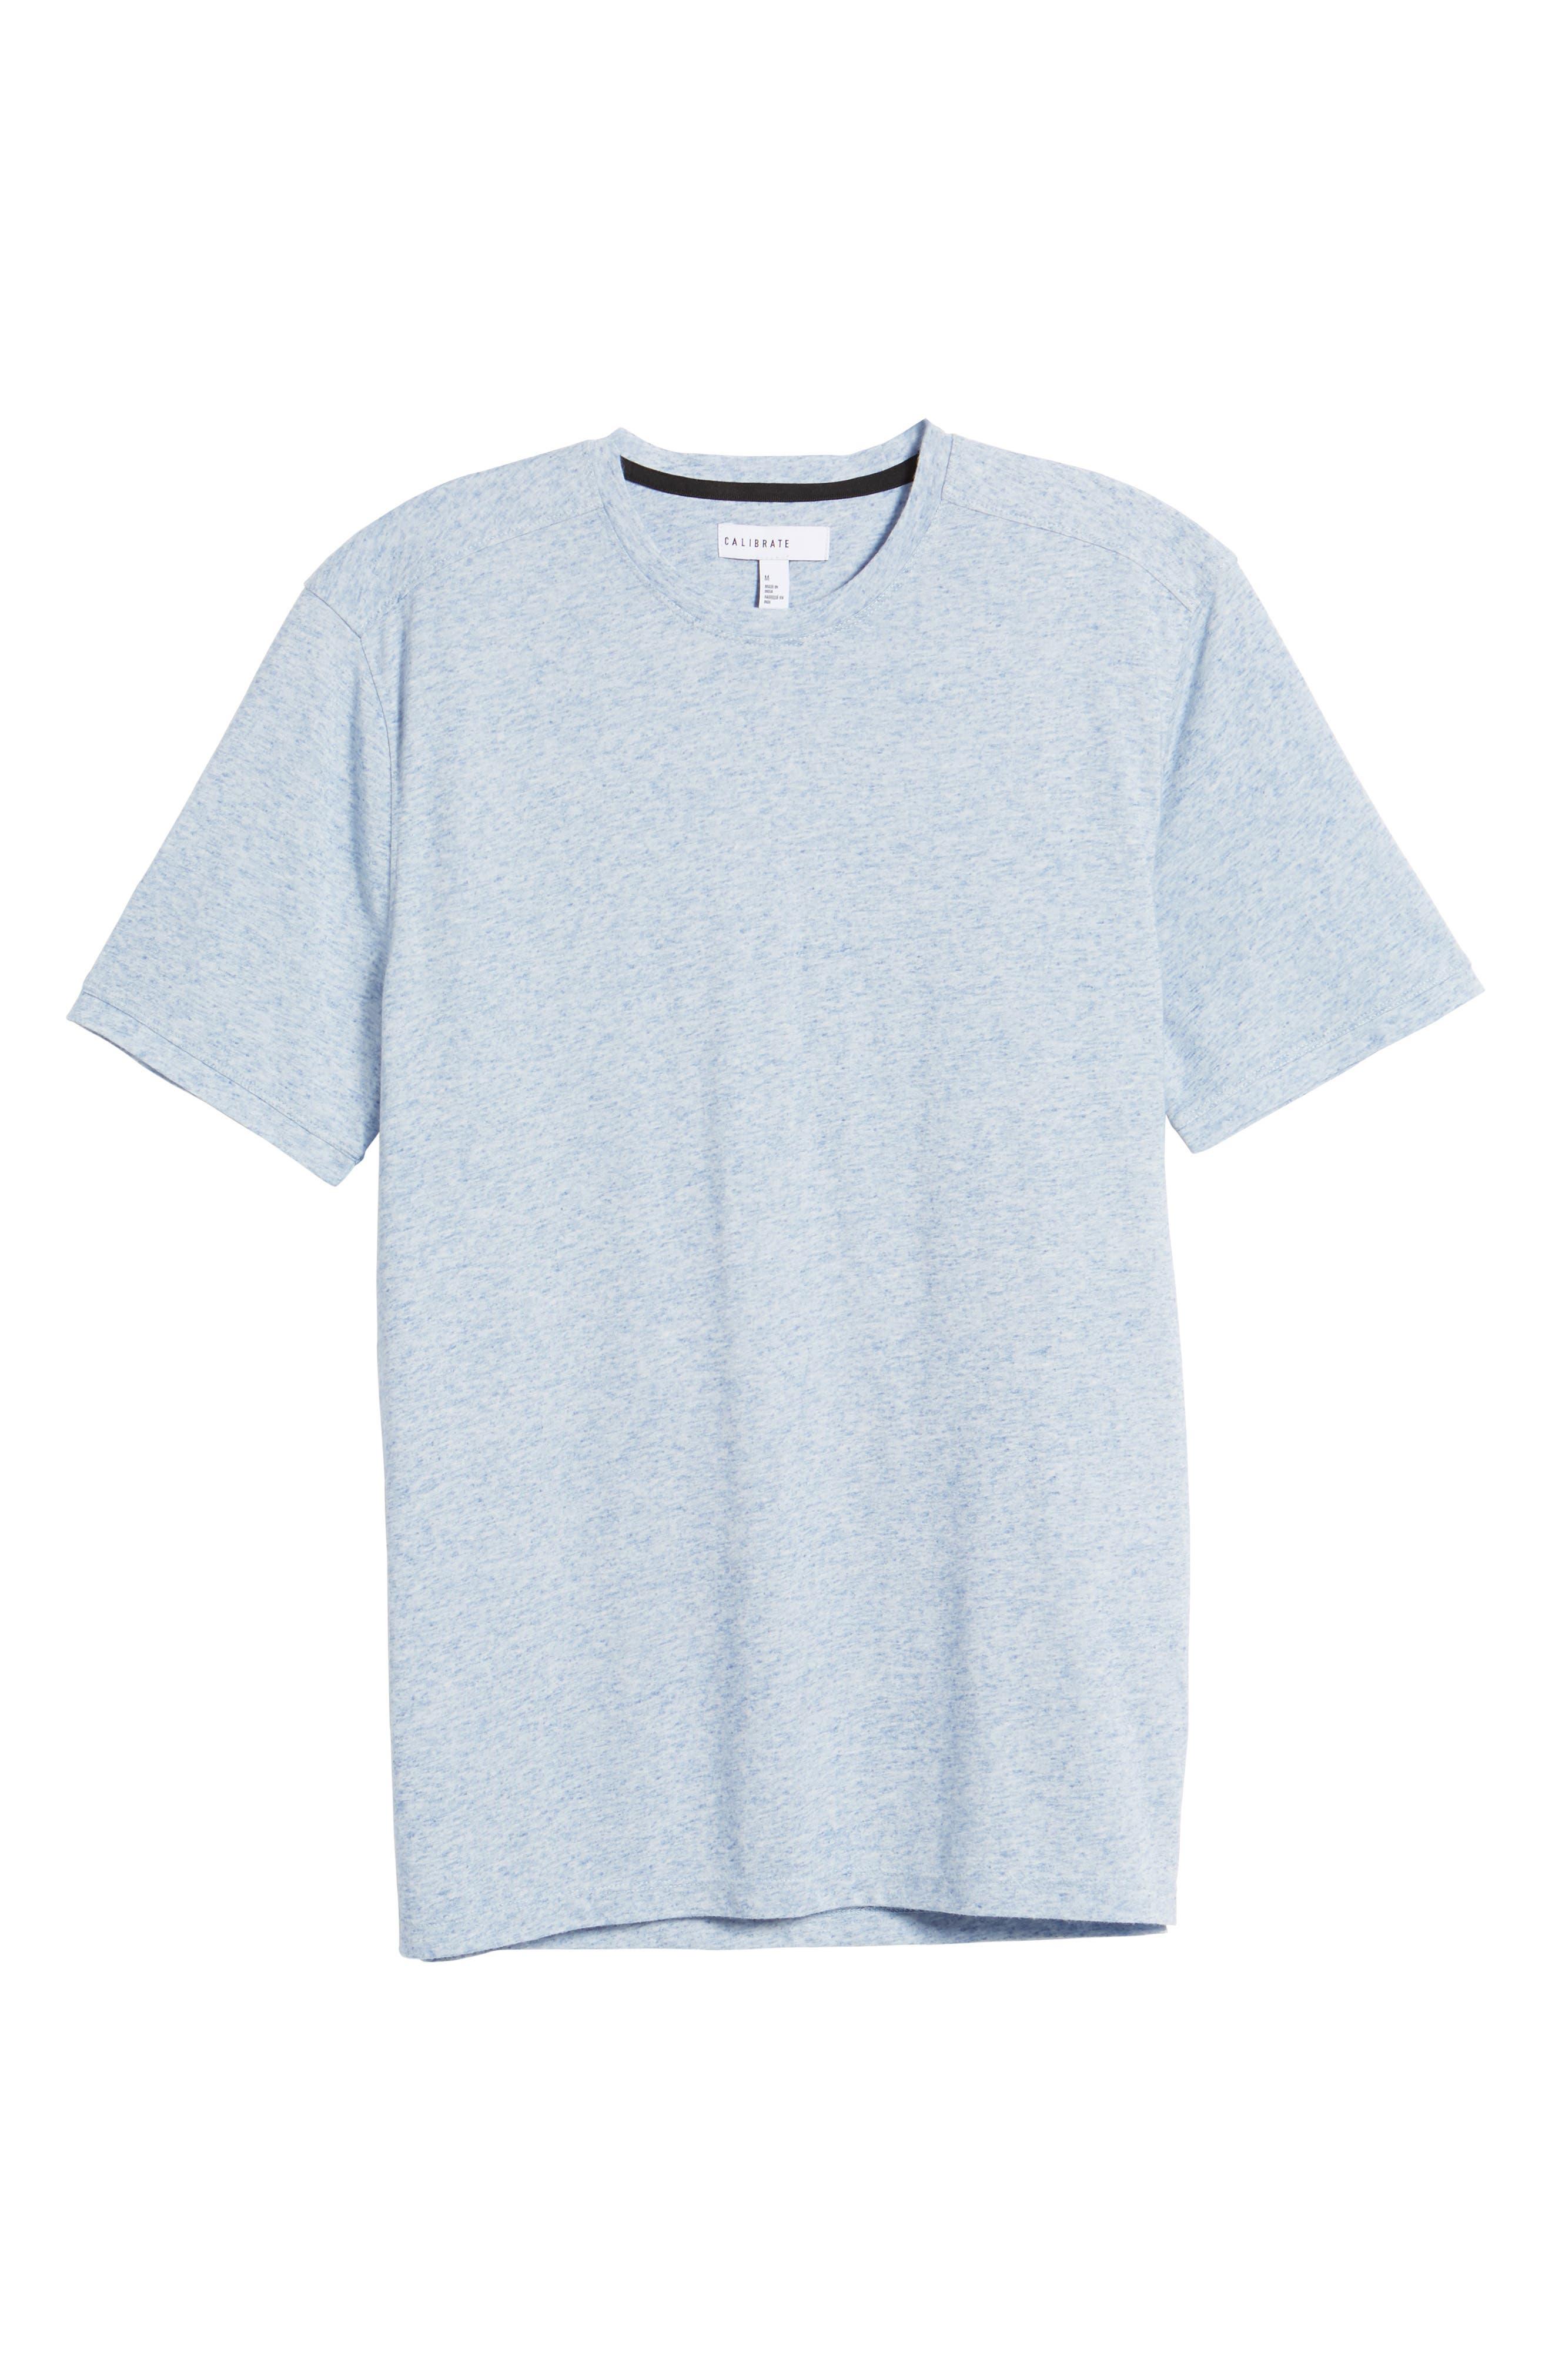 Crewneck T-Shirt,                             Alternate thumbnail 6, color,                             Blue Lake Heather